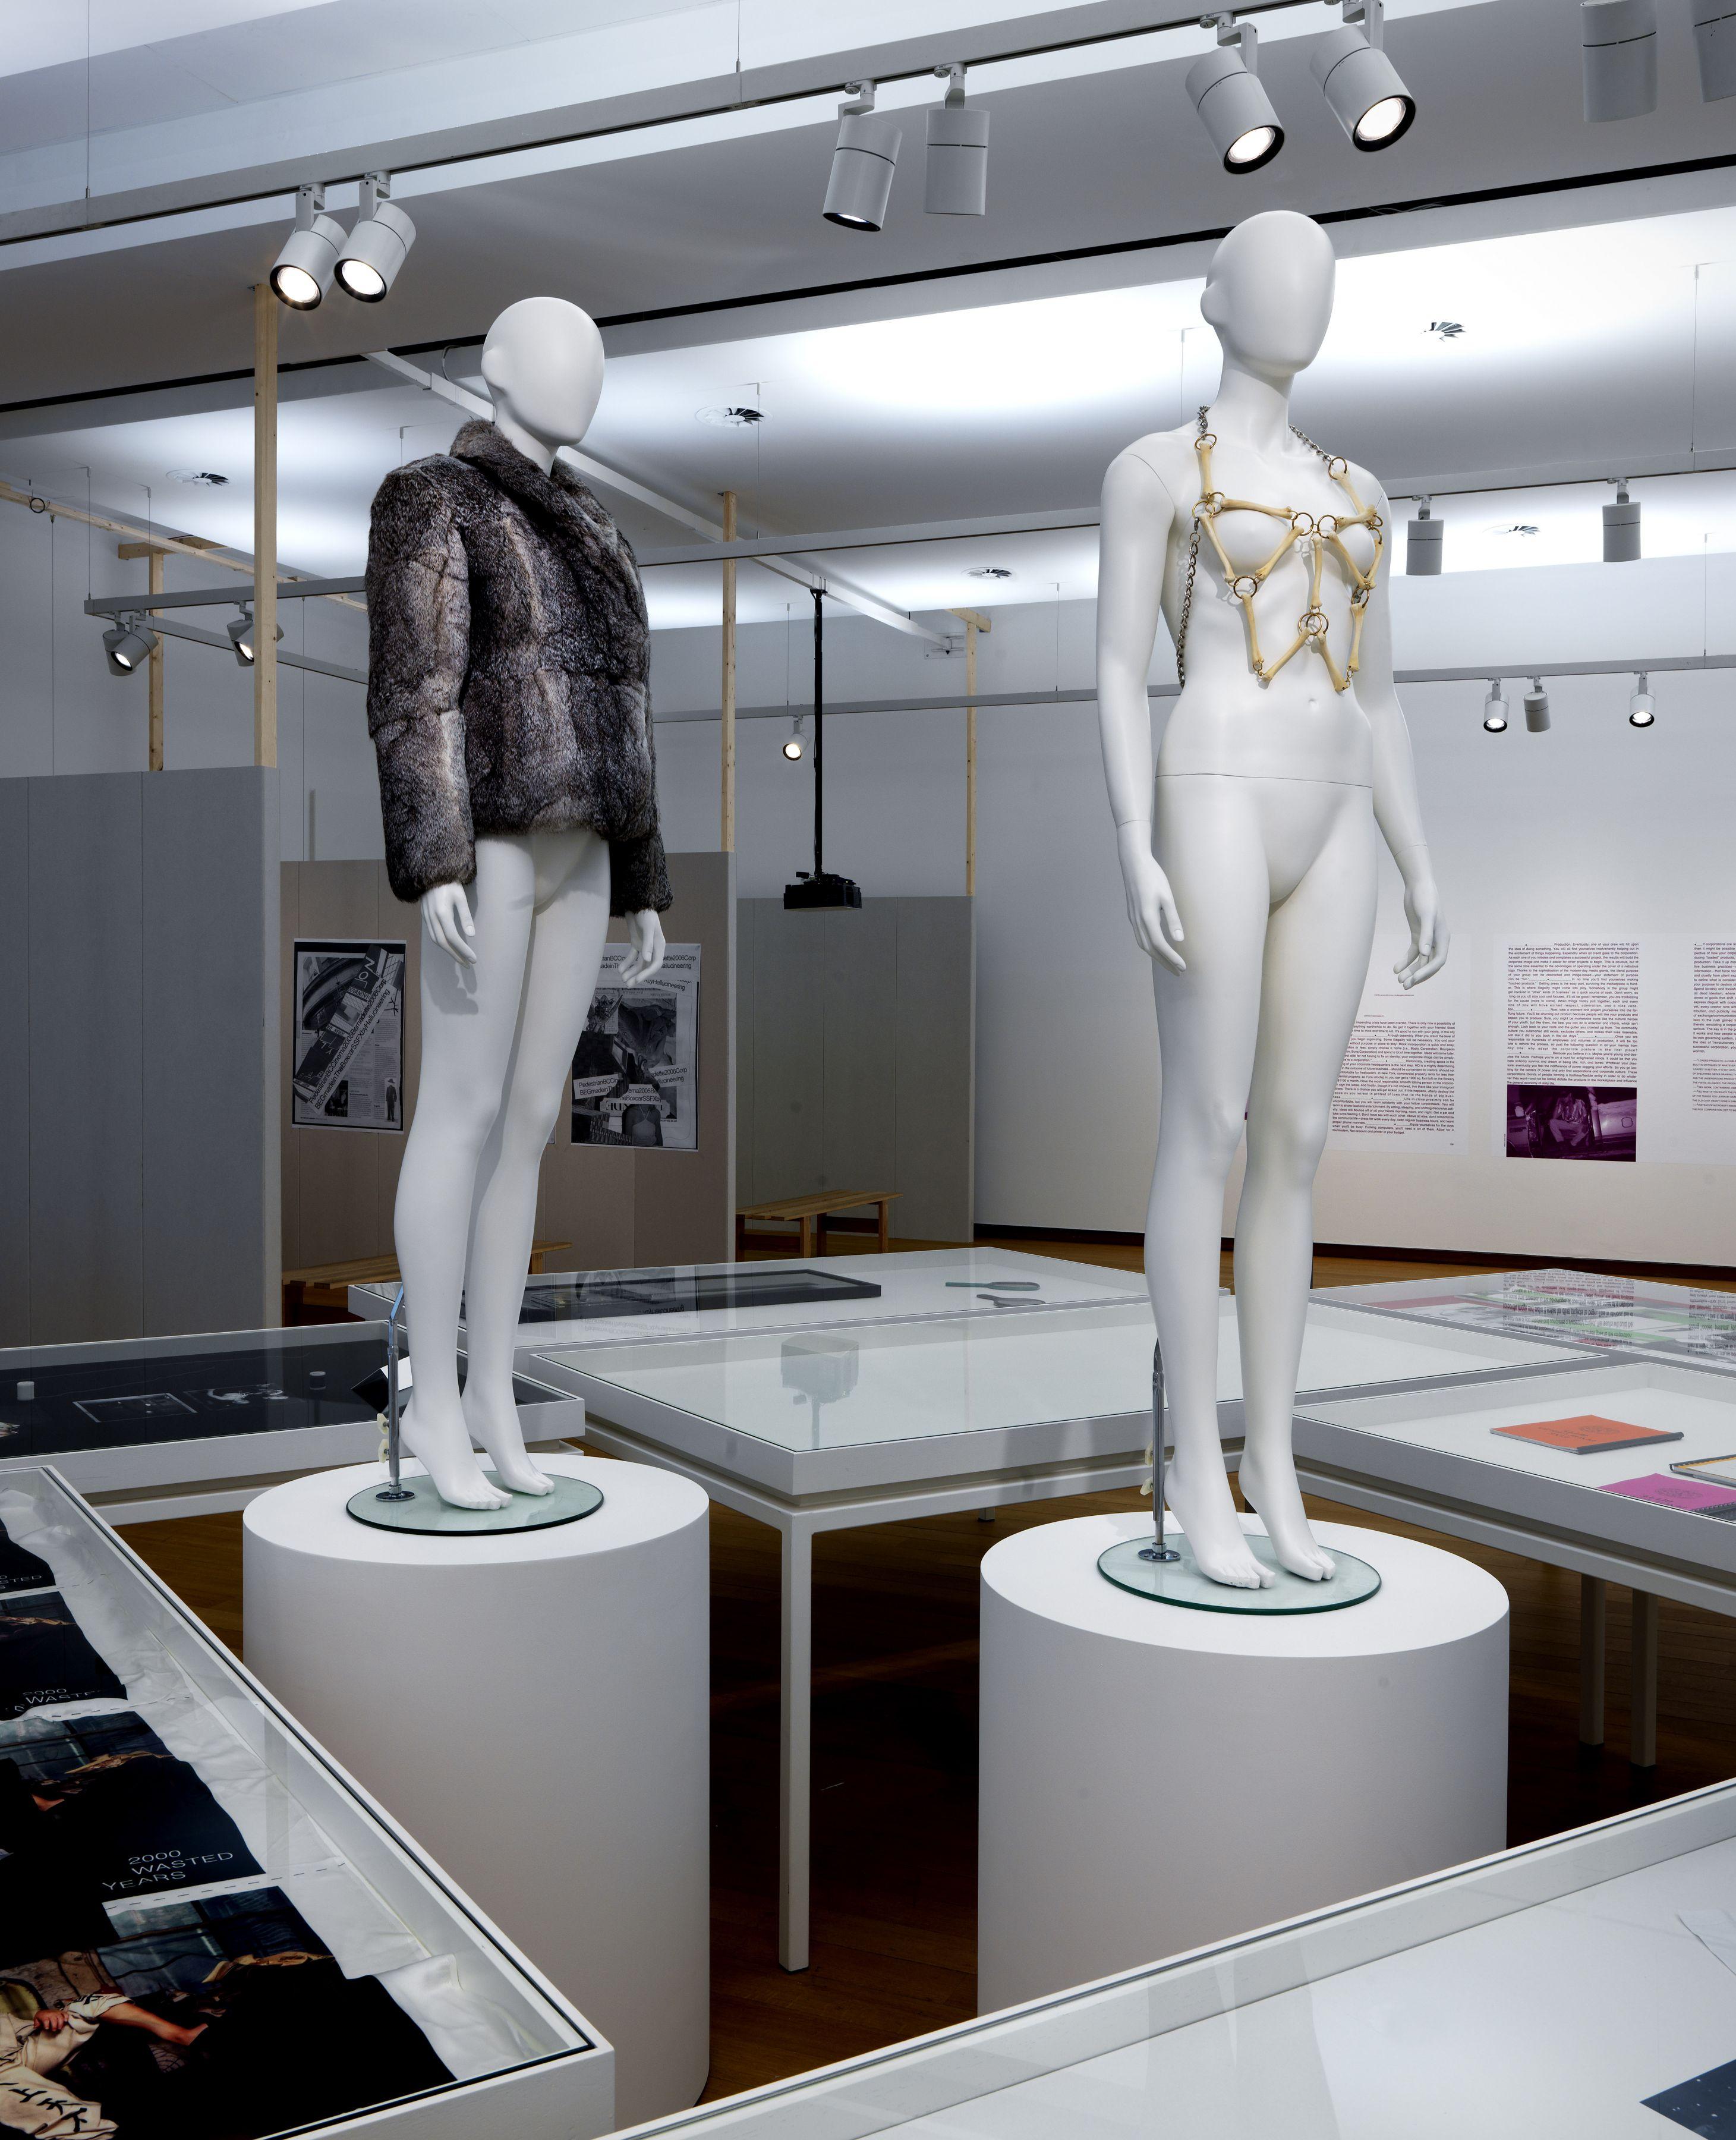 Installation view, Bernadette Corporation: Multiplyplex, Stedelijk Museum, Amsterdam, 2016